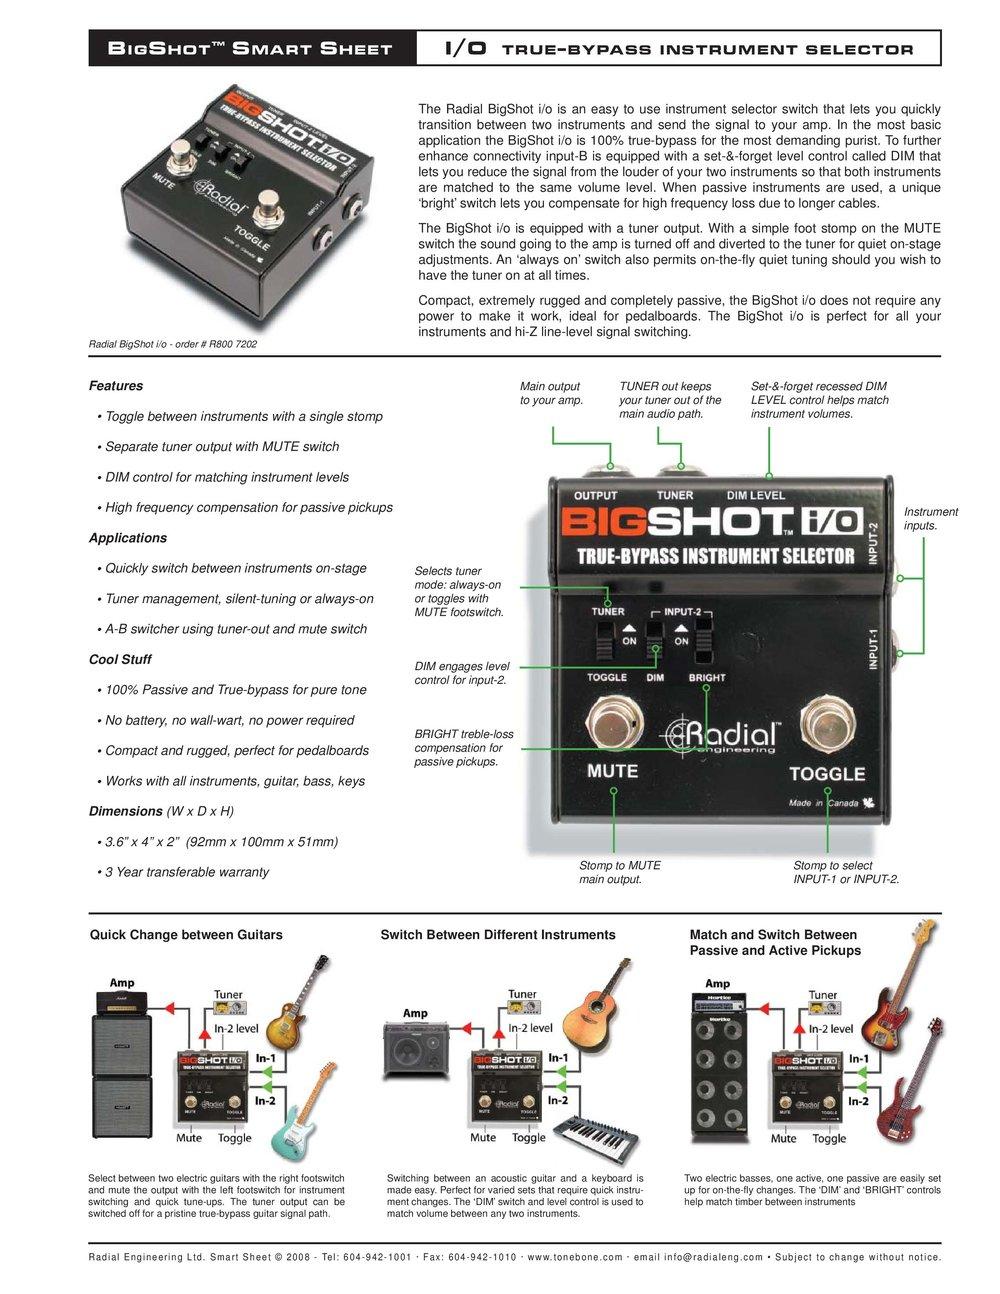 smartsheet-bigshot-io-page-001.jpg